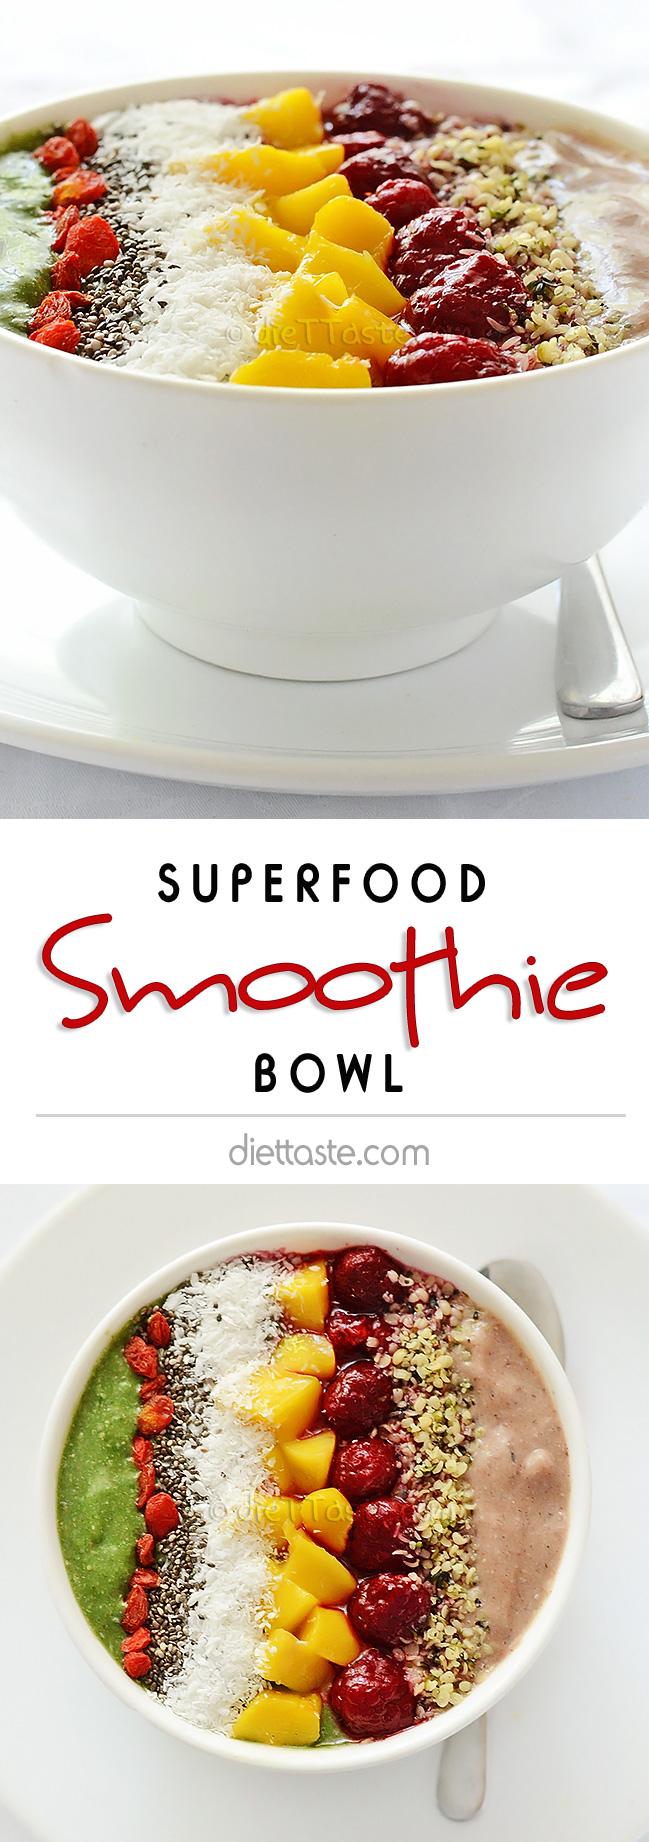 Superfood Smoothie Bowl - diettaste.com